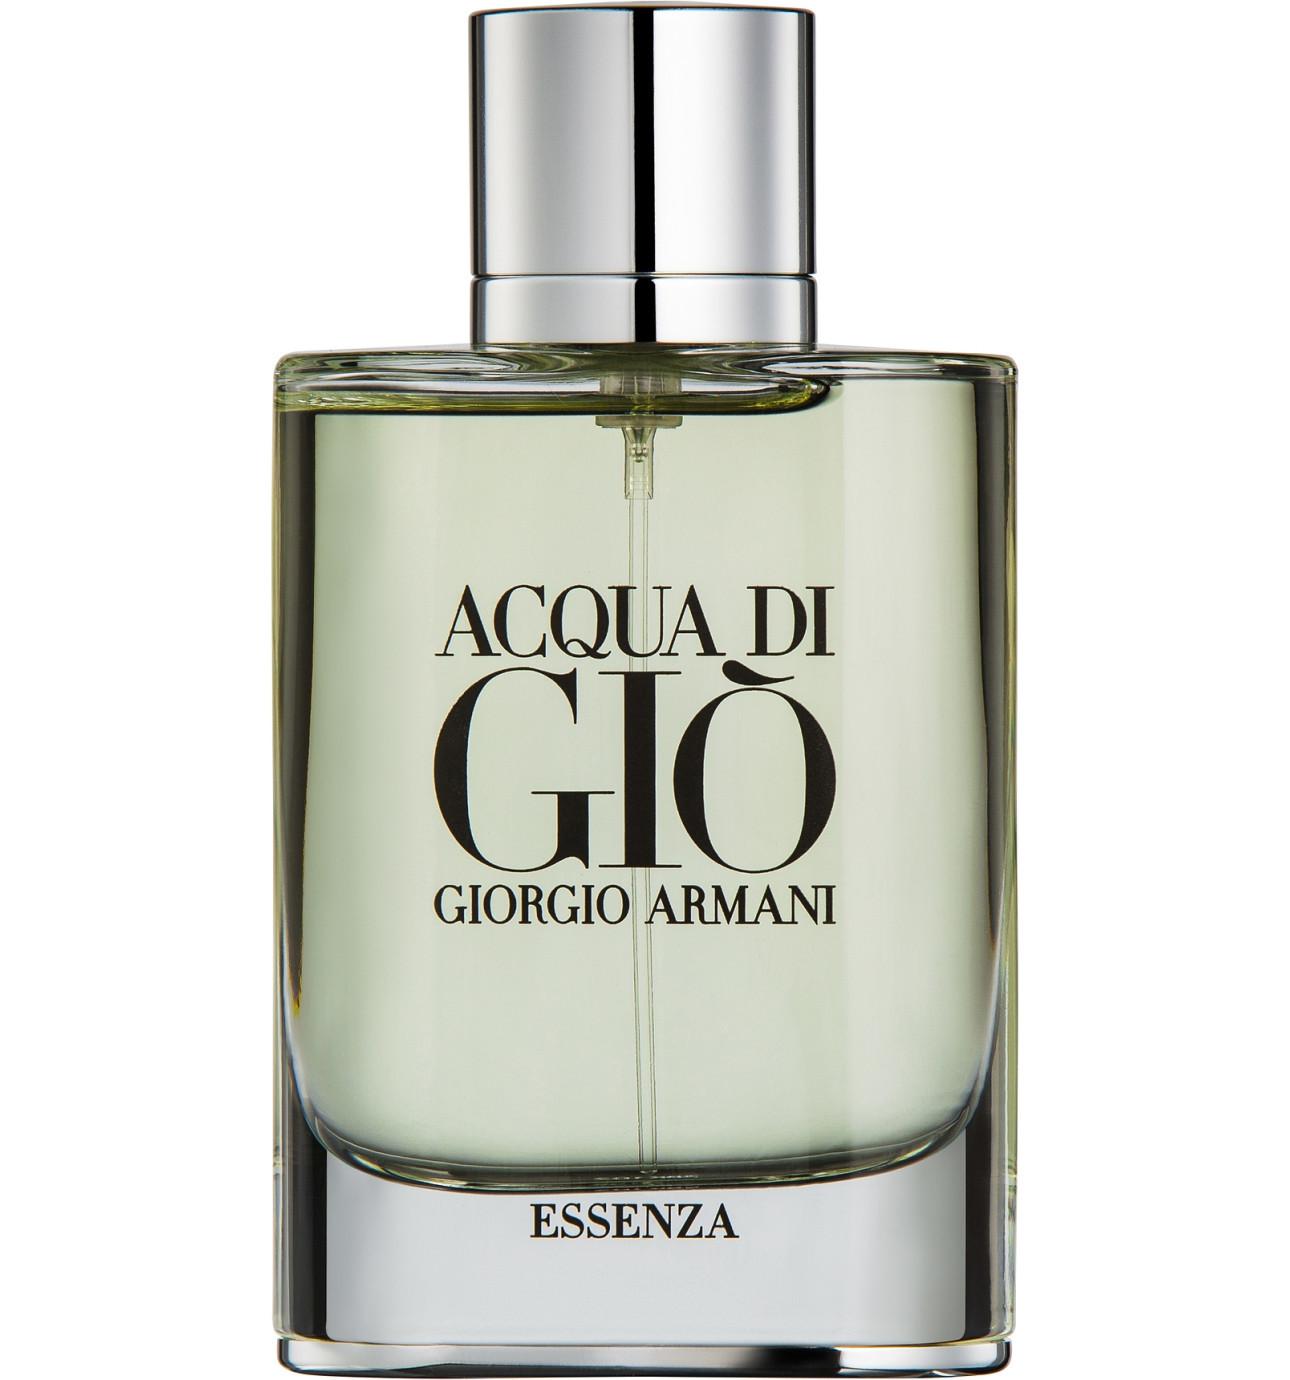 Di Acqua Essenza Homme Parfum 75 Vapo Gio Ml Armani armani PiOZuwkXT